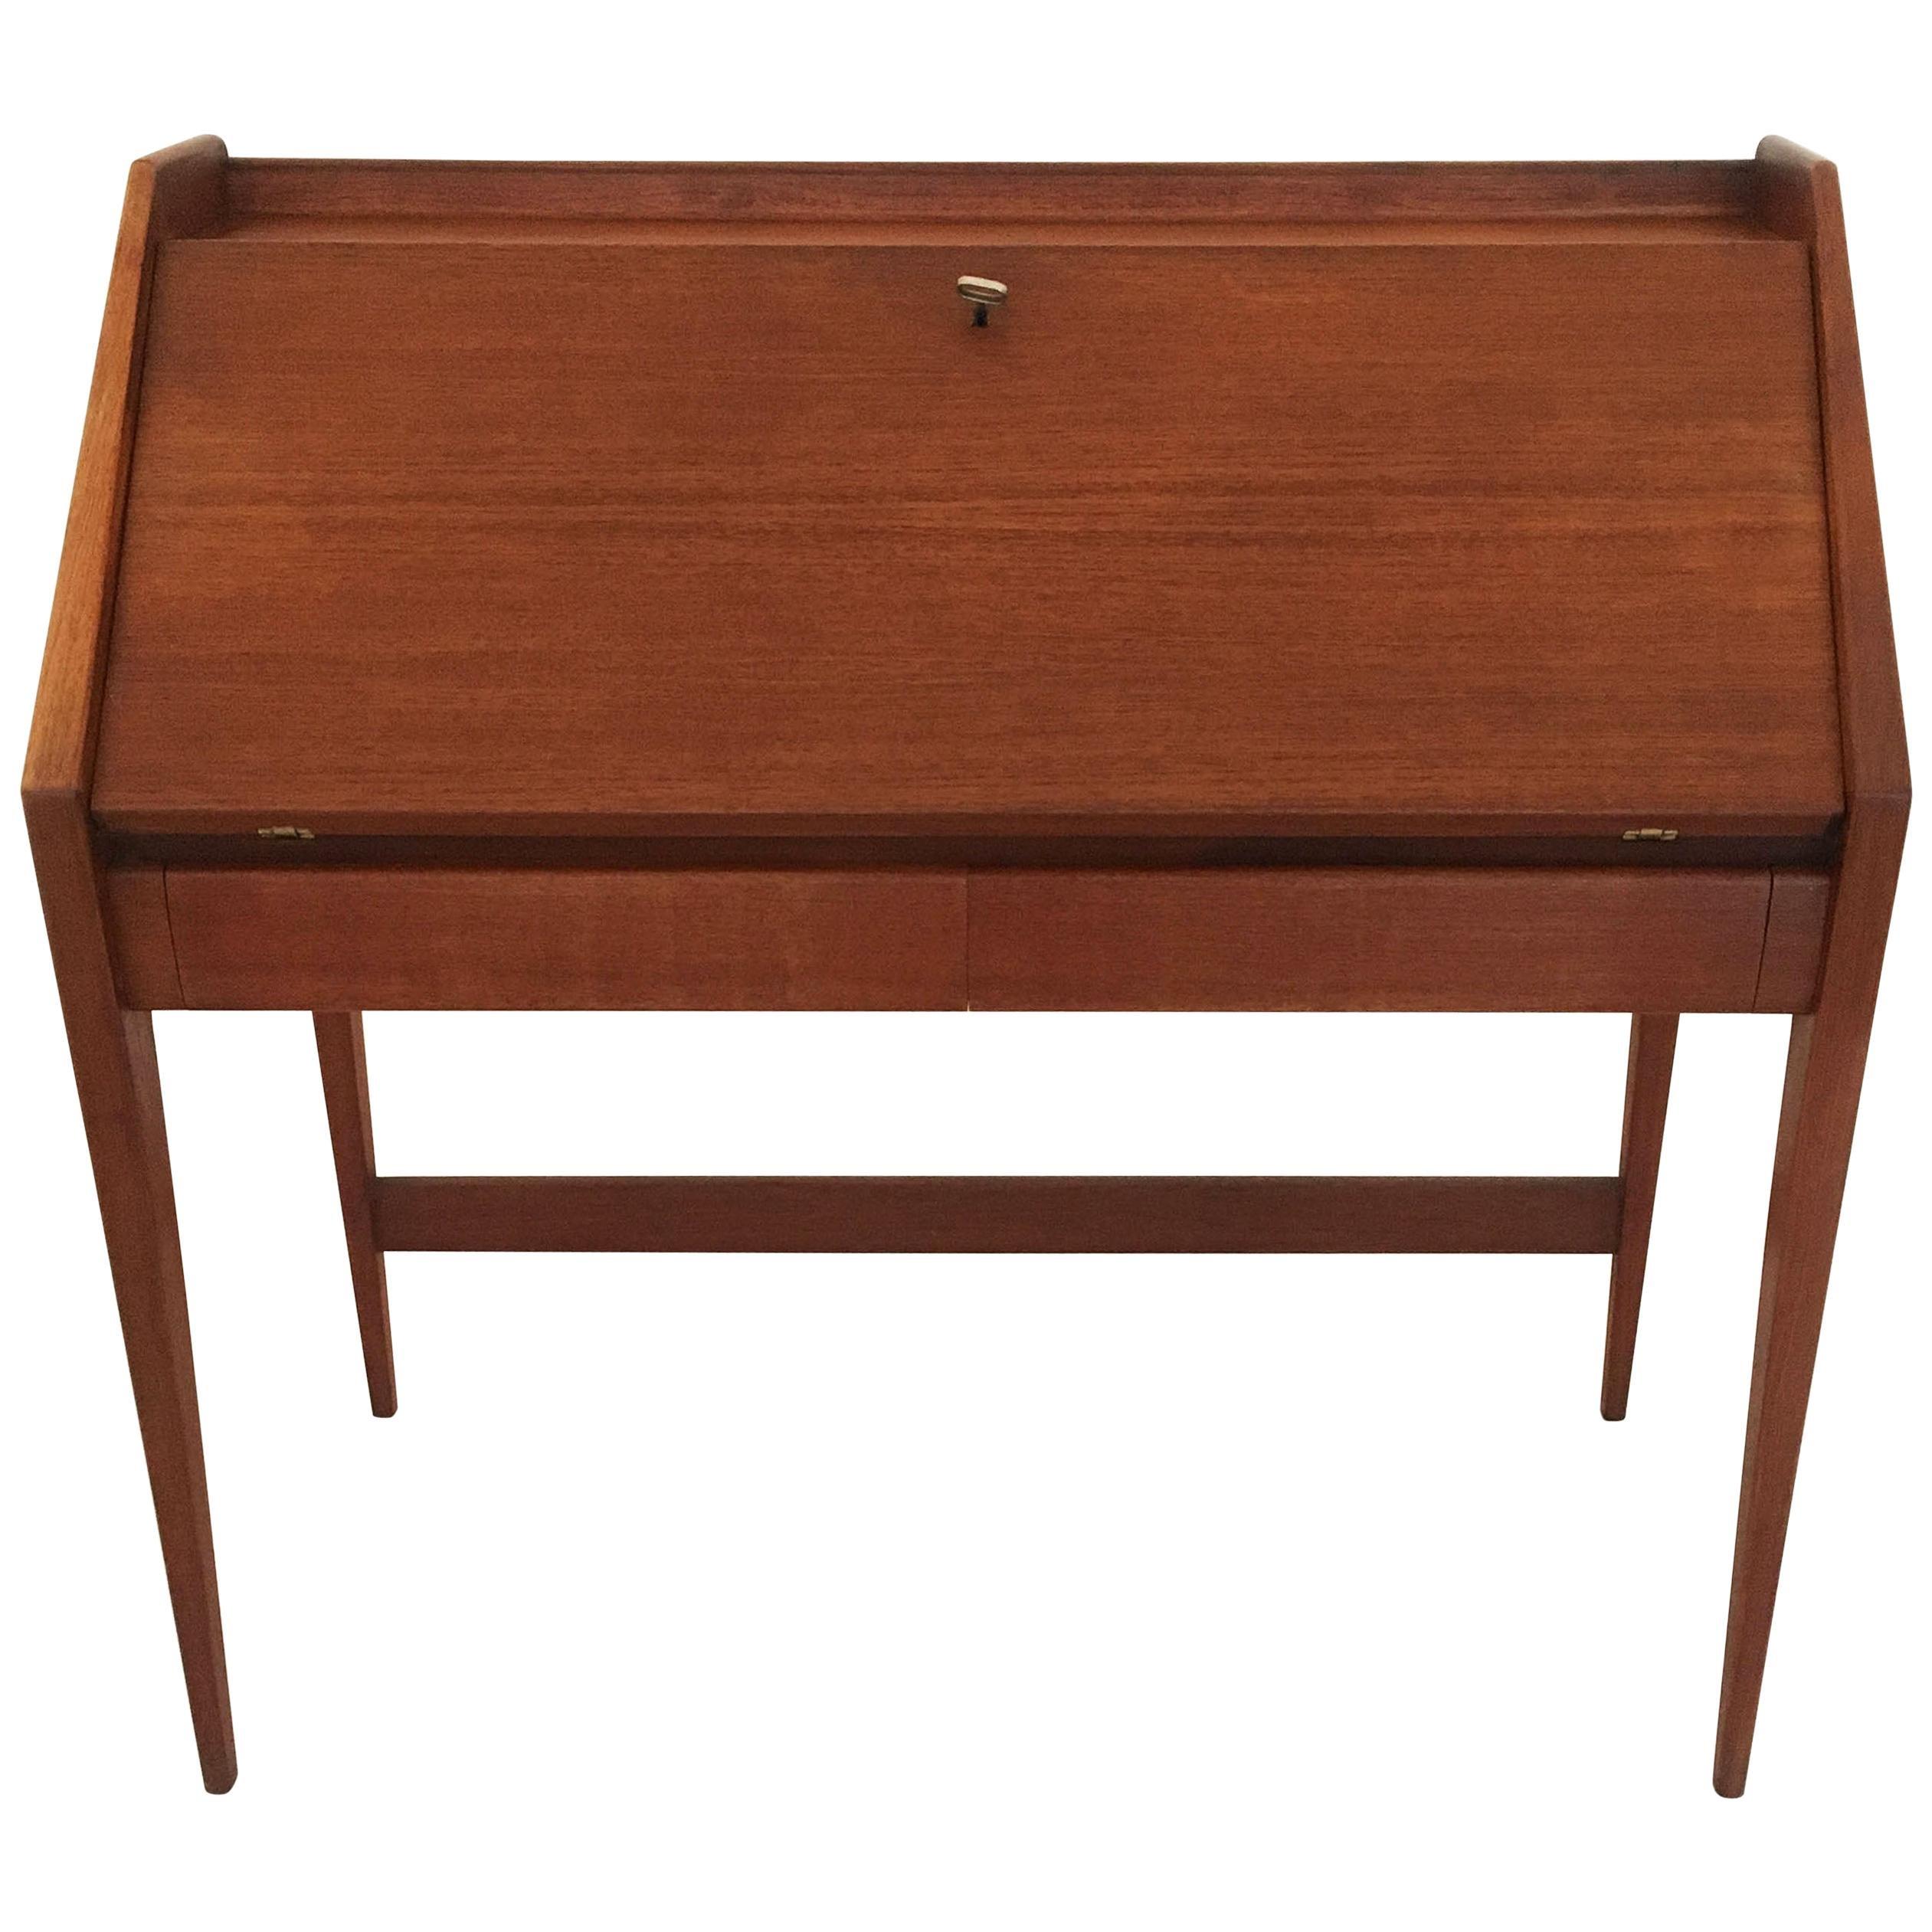 Mid-Century Modern Teak Desk, Writing Table by Walter Wirz for Wilhelm Renz